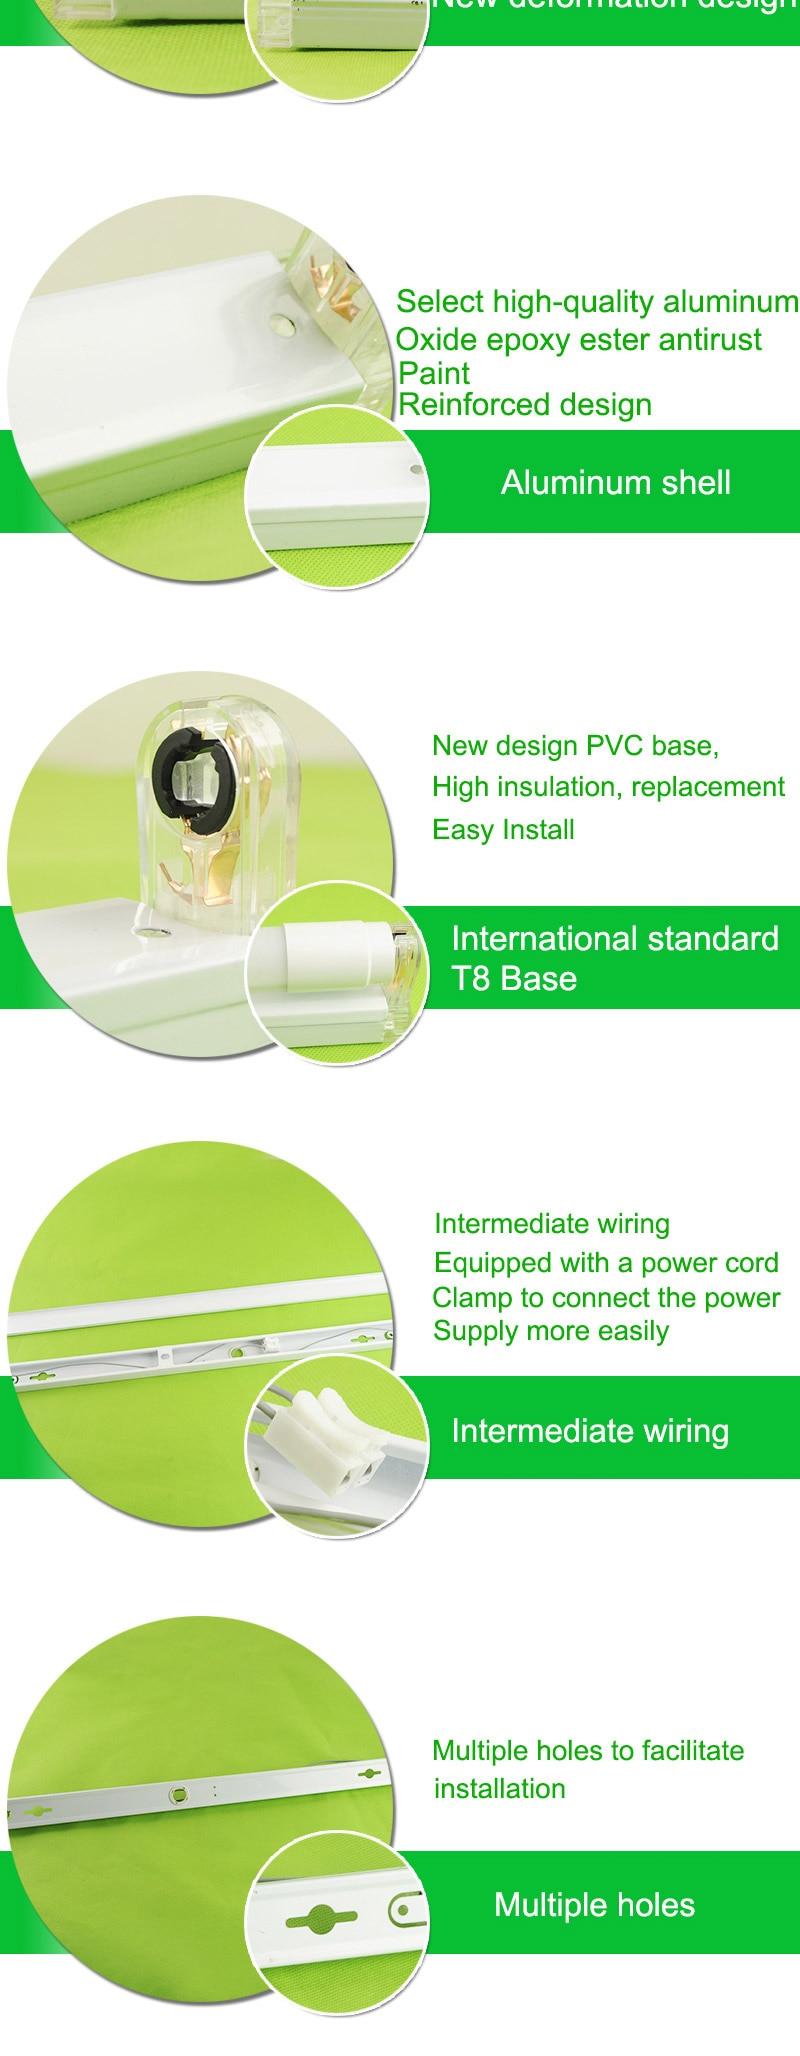 Buy Led Tube T8 Fixtures Bracket 10w 60cm 2feet Wiring Light In Series Multiple Fluorescent For 2ft 06m 600mm Lamp Support Stent Connection Base Holder Socket